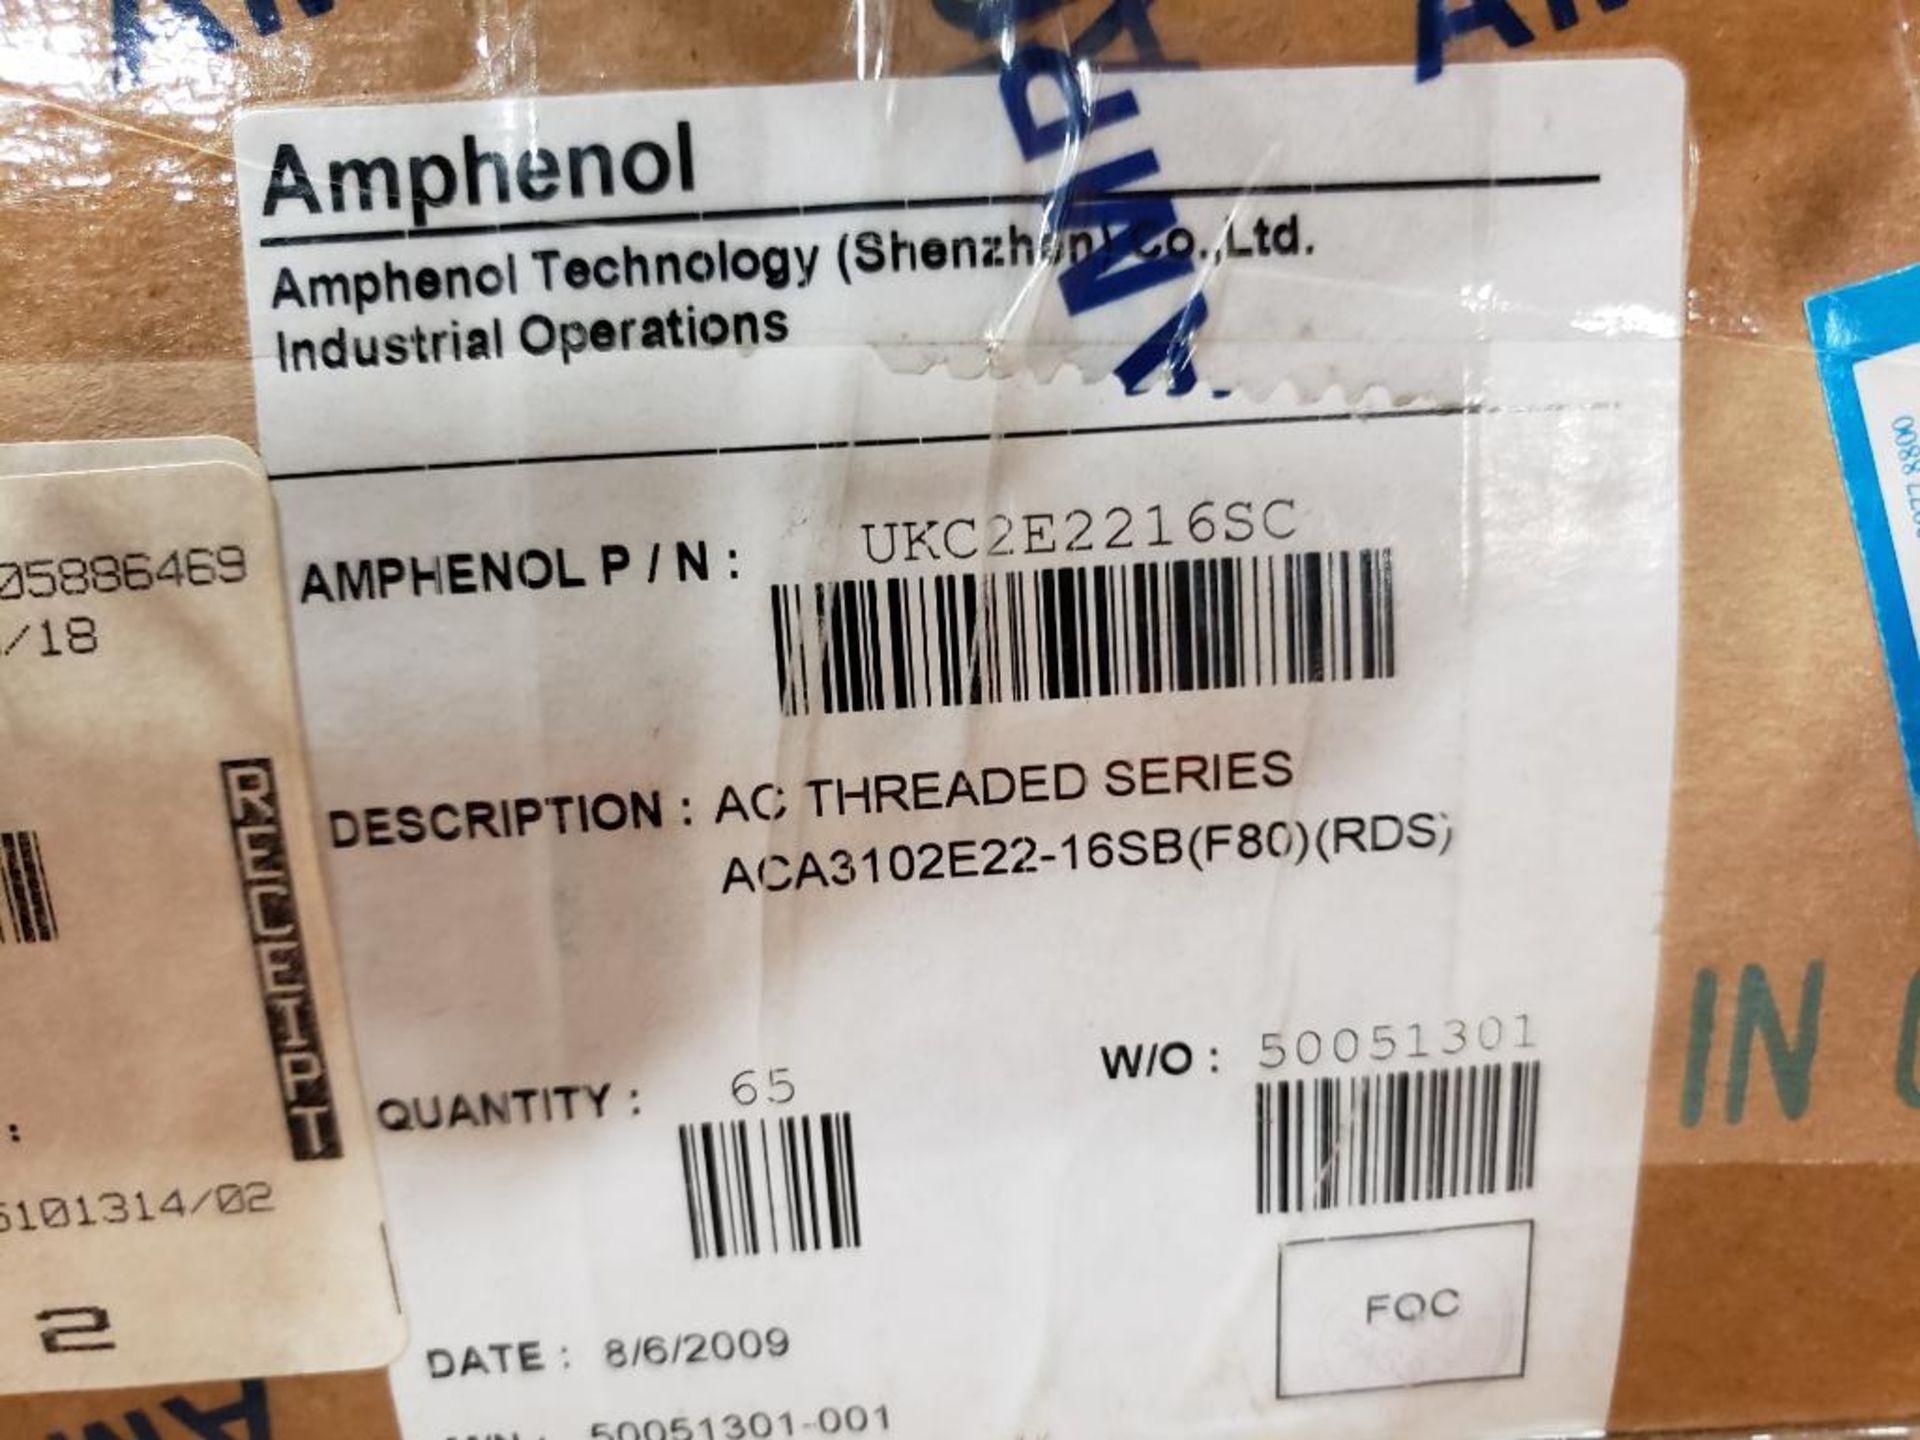 Qty 65 - Amphenol UKC2E2216SC AC Threaded series plug connector.